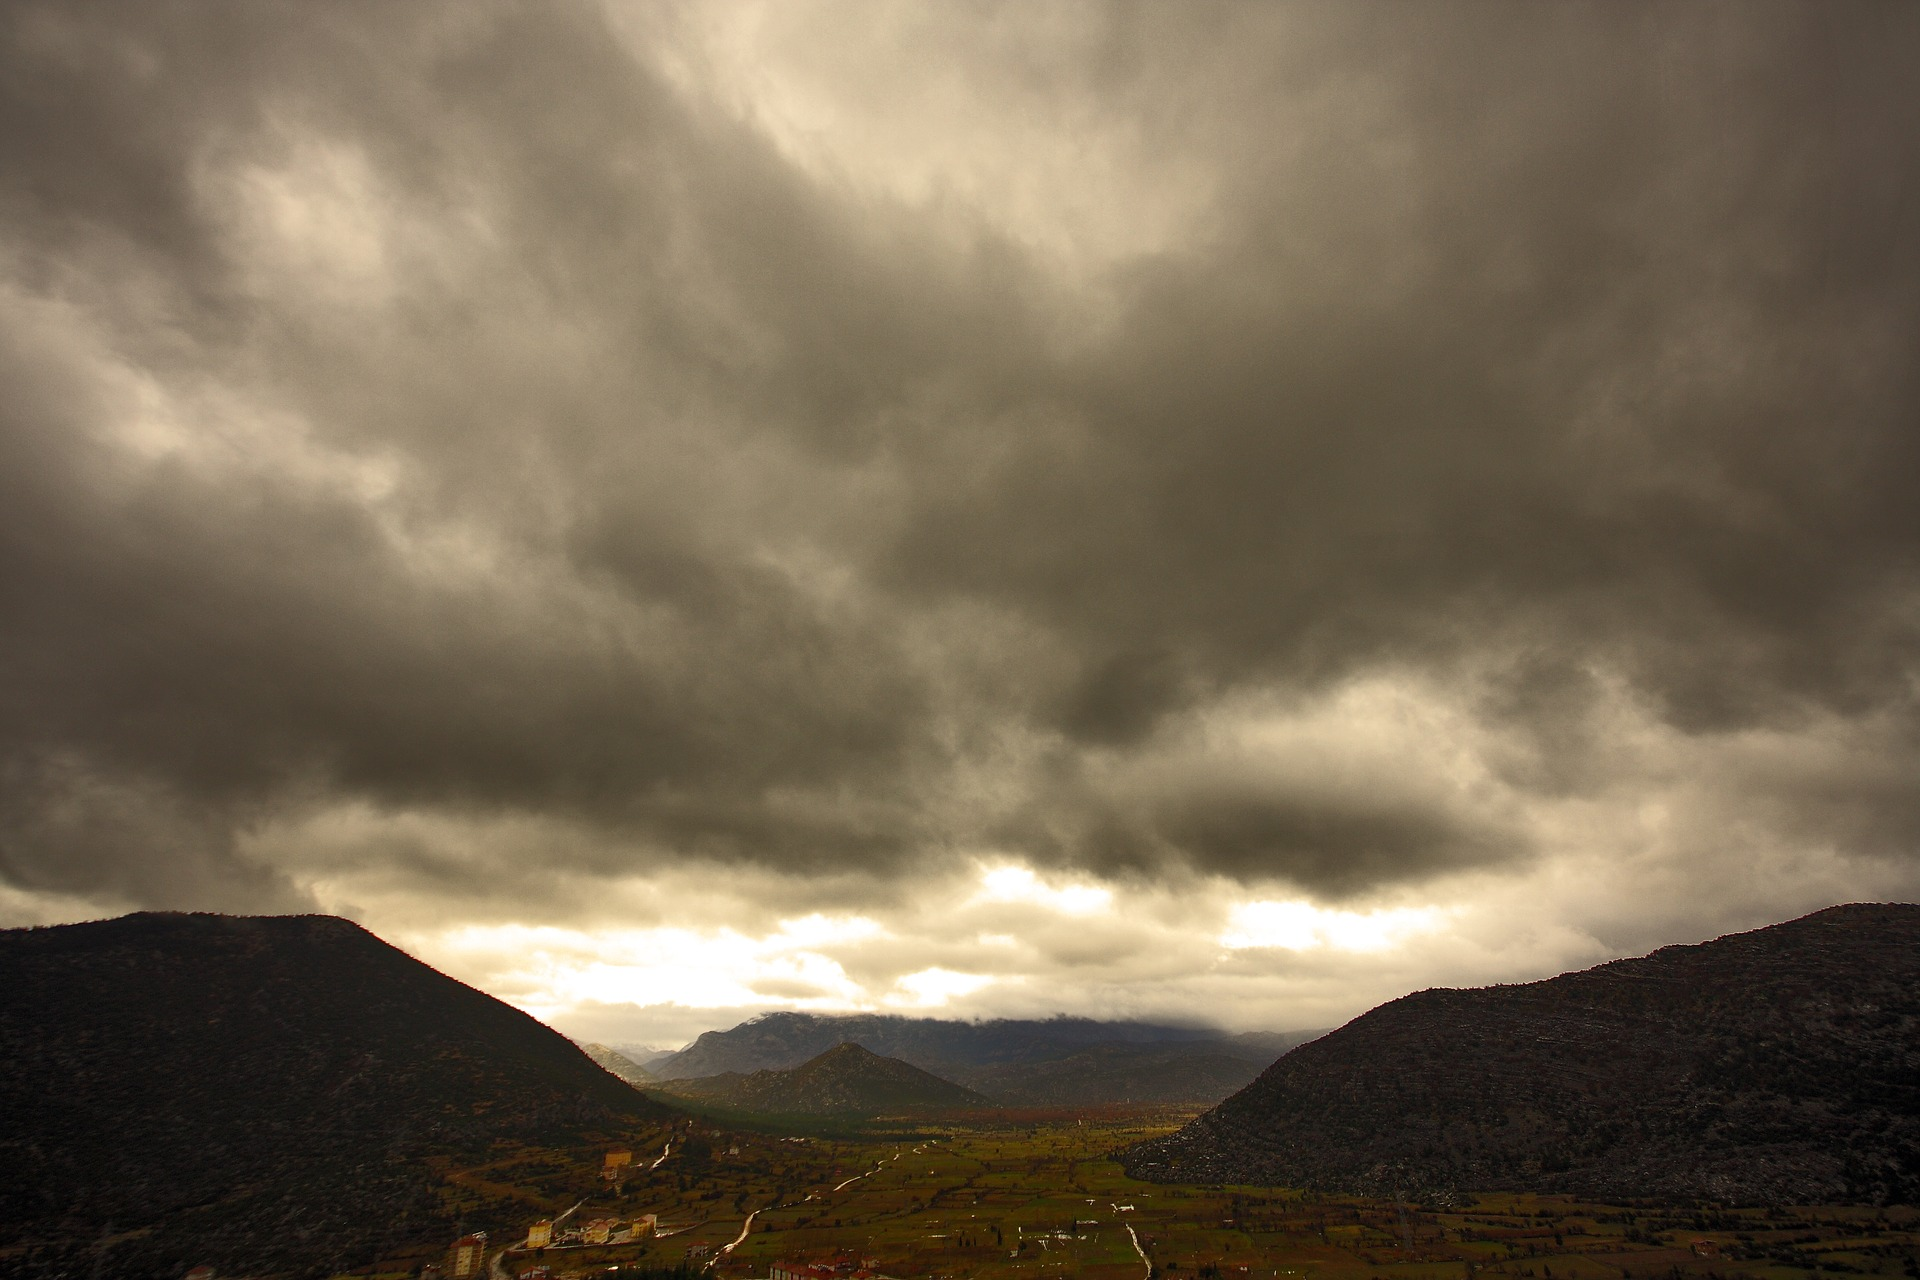 mountain-2857781_1920.jpg